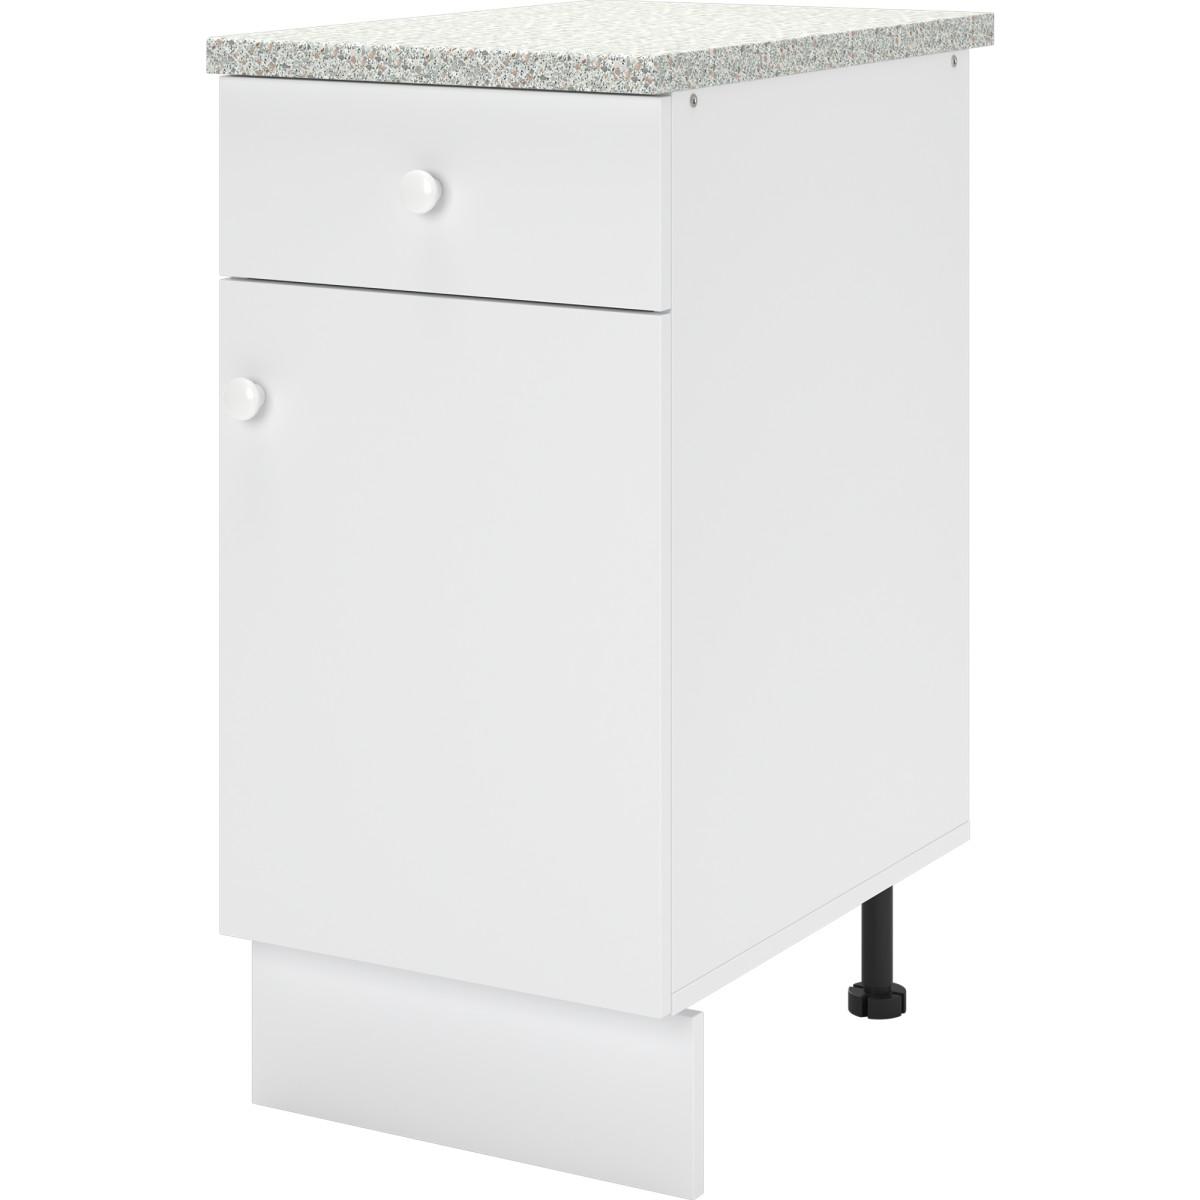 Шкаф напольный Бэлла 40x84x60 см ЛДСП цвет белый